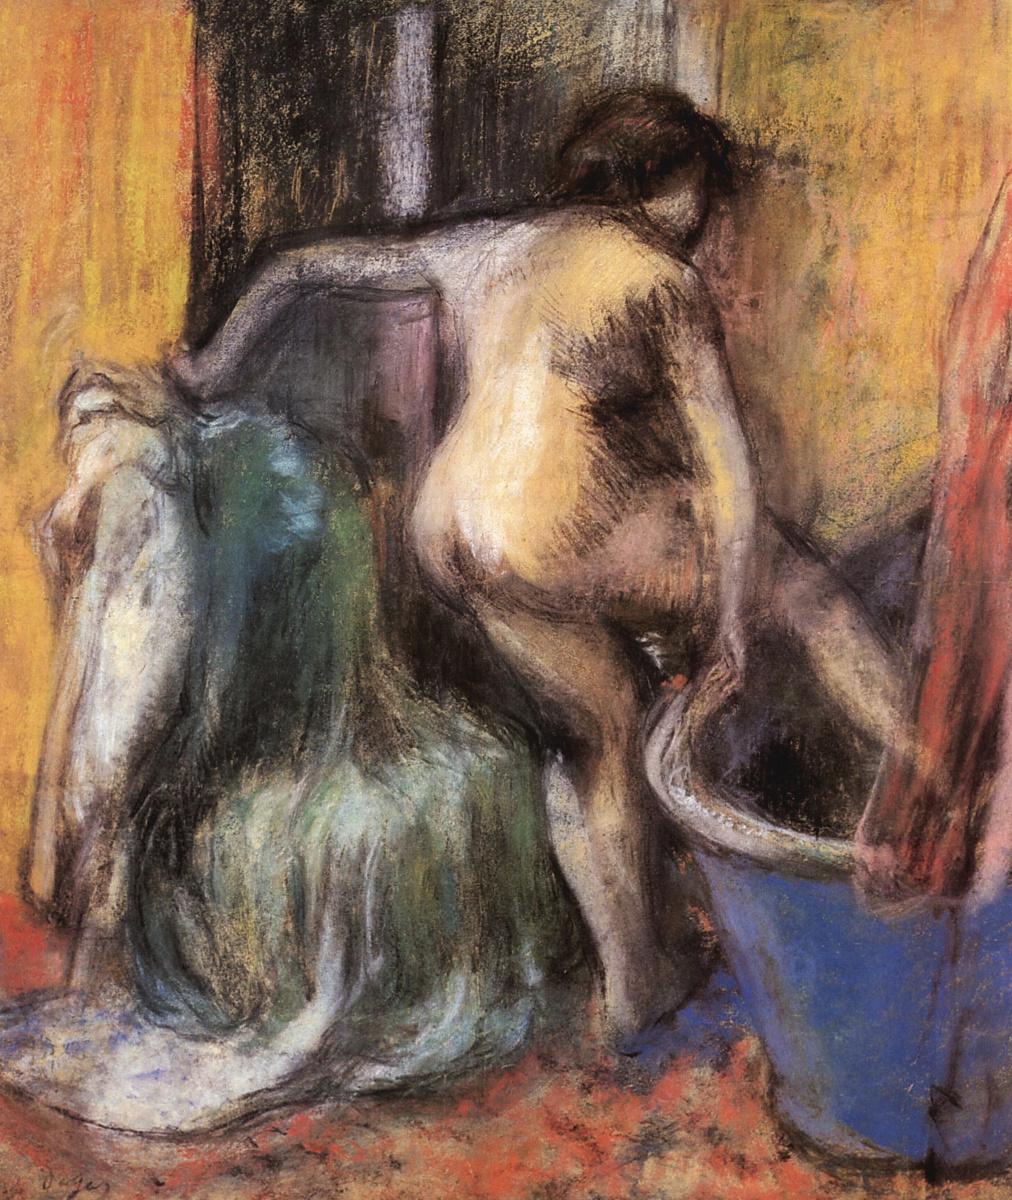 Edgar Degas. Nude, incoming in the tub